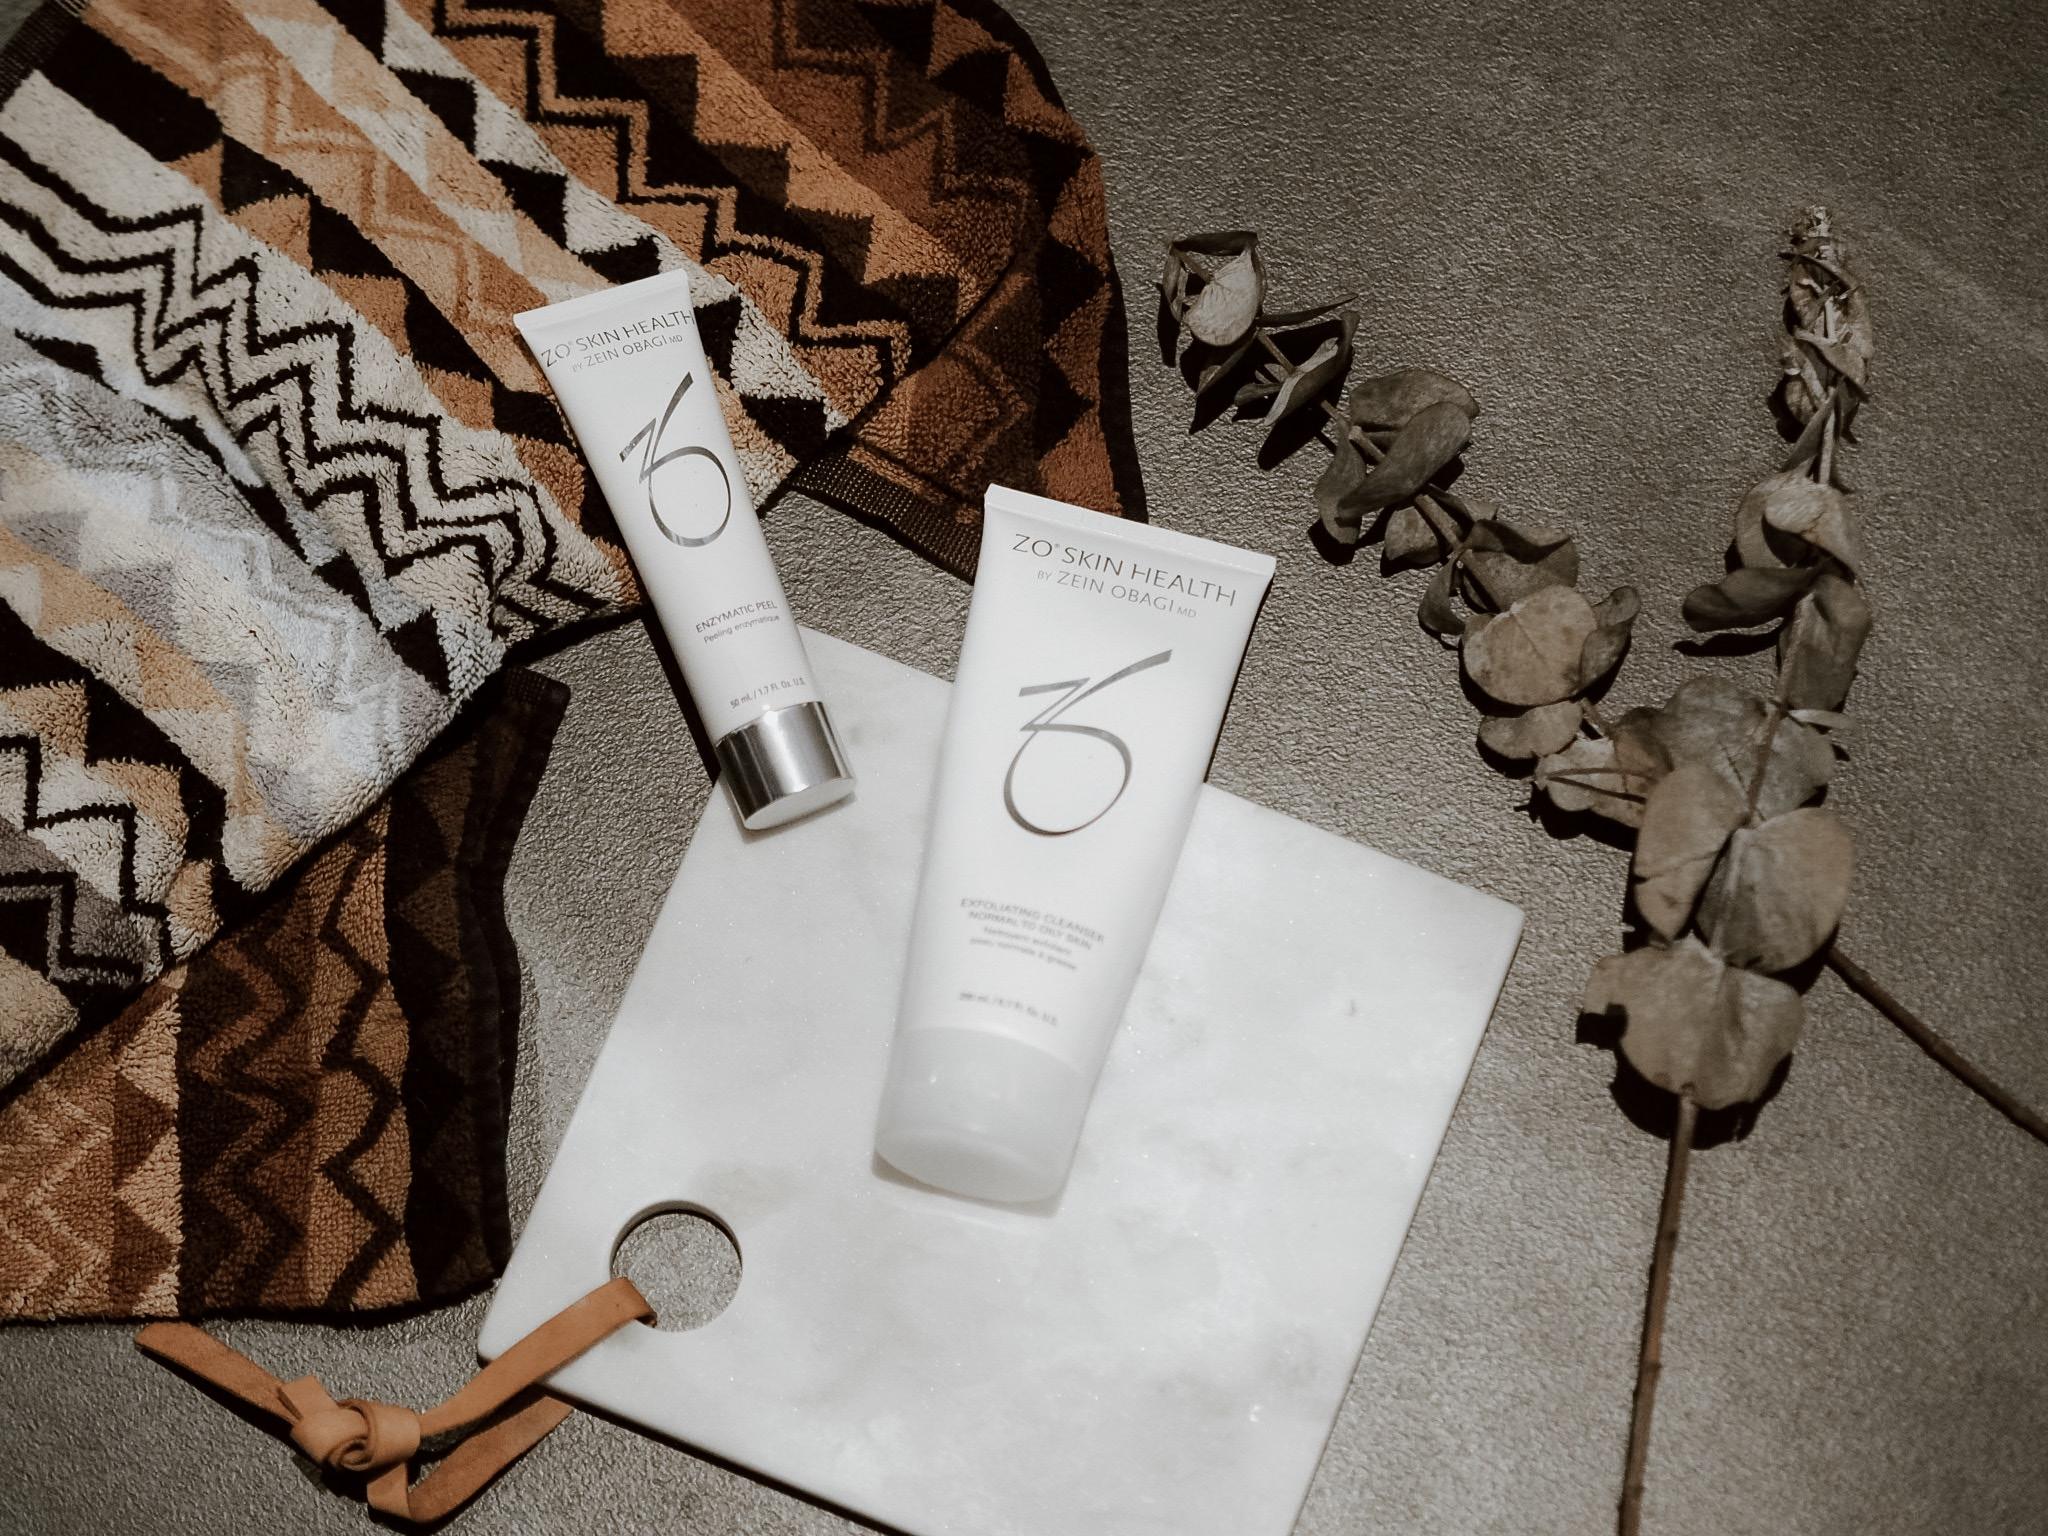 Rens, skrub og ansiktsmaske - -fra Zo Skin